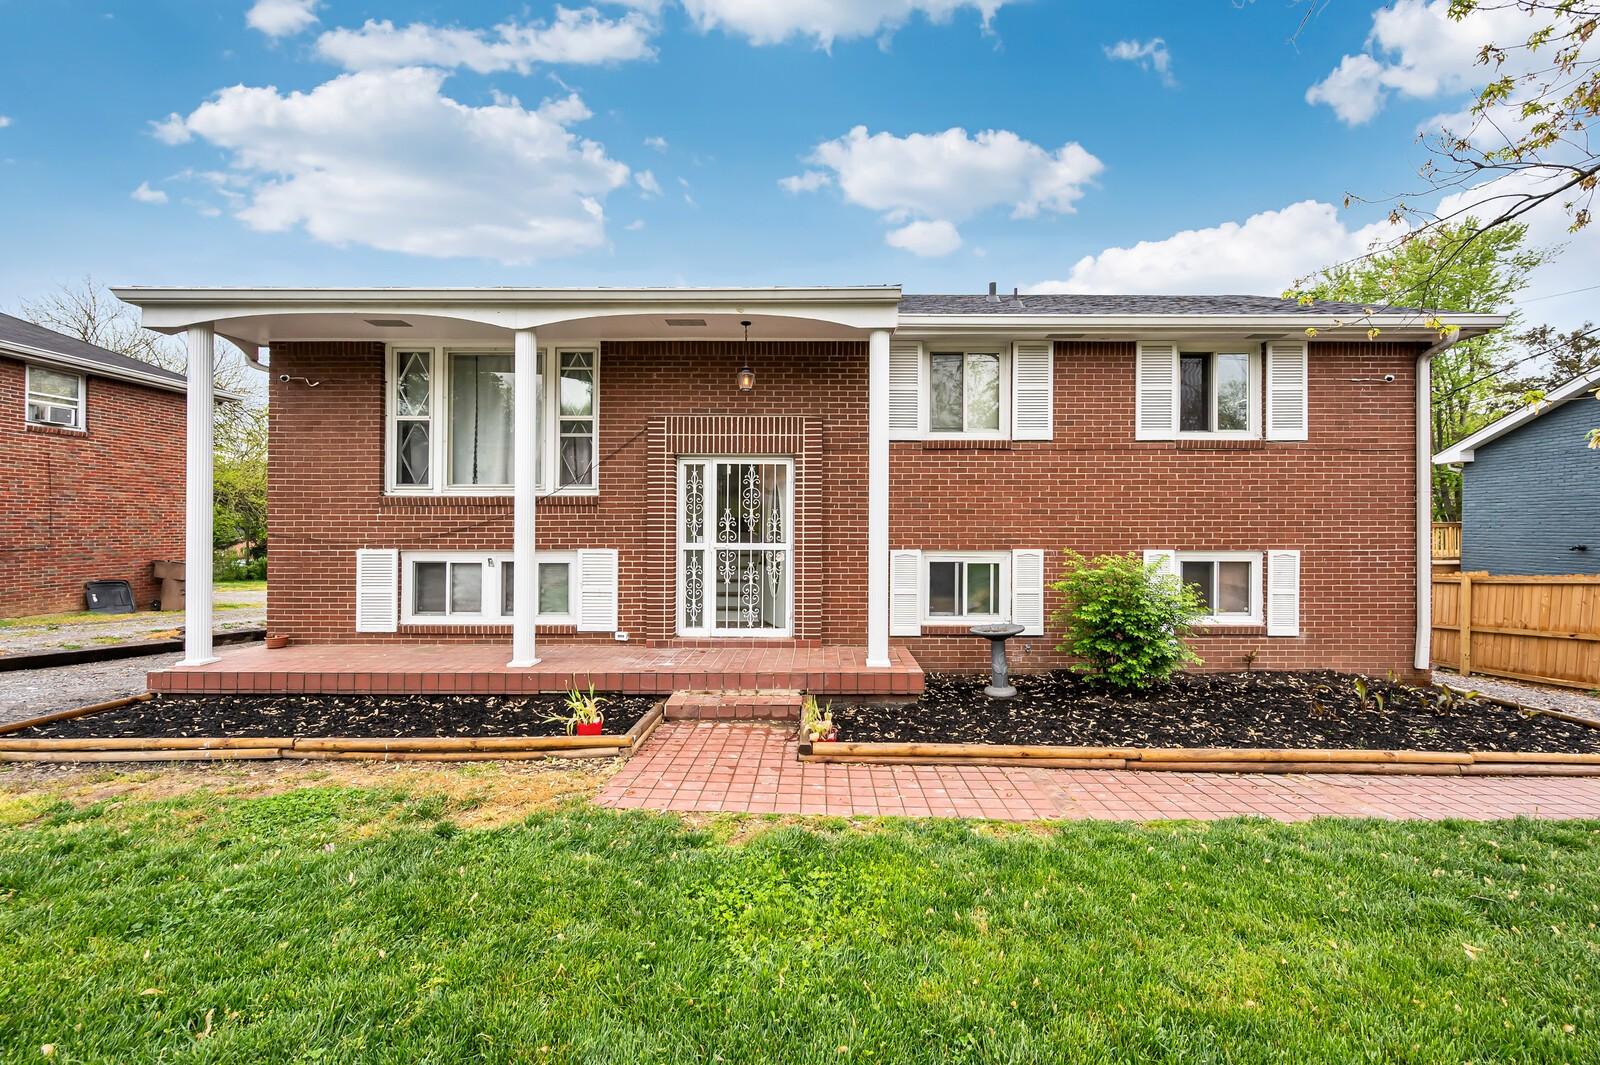 4816 Sunlight Dr Property Photo - Nashville, TN real estate listing